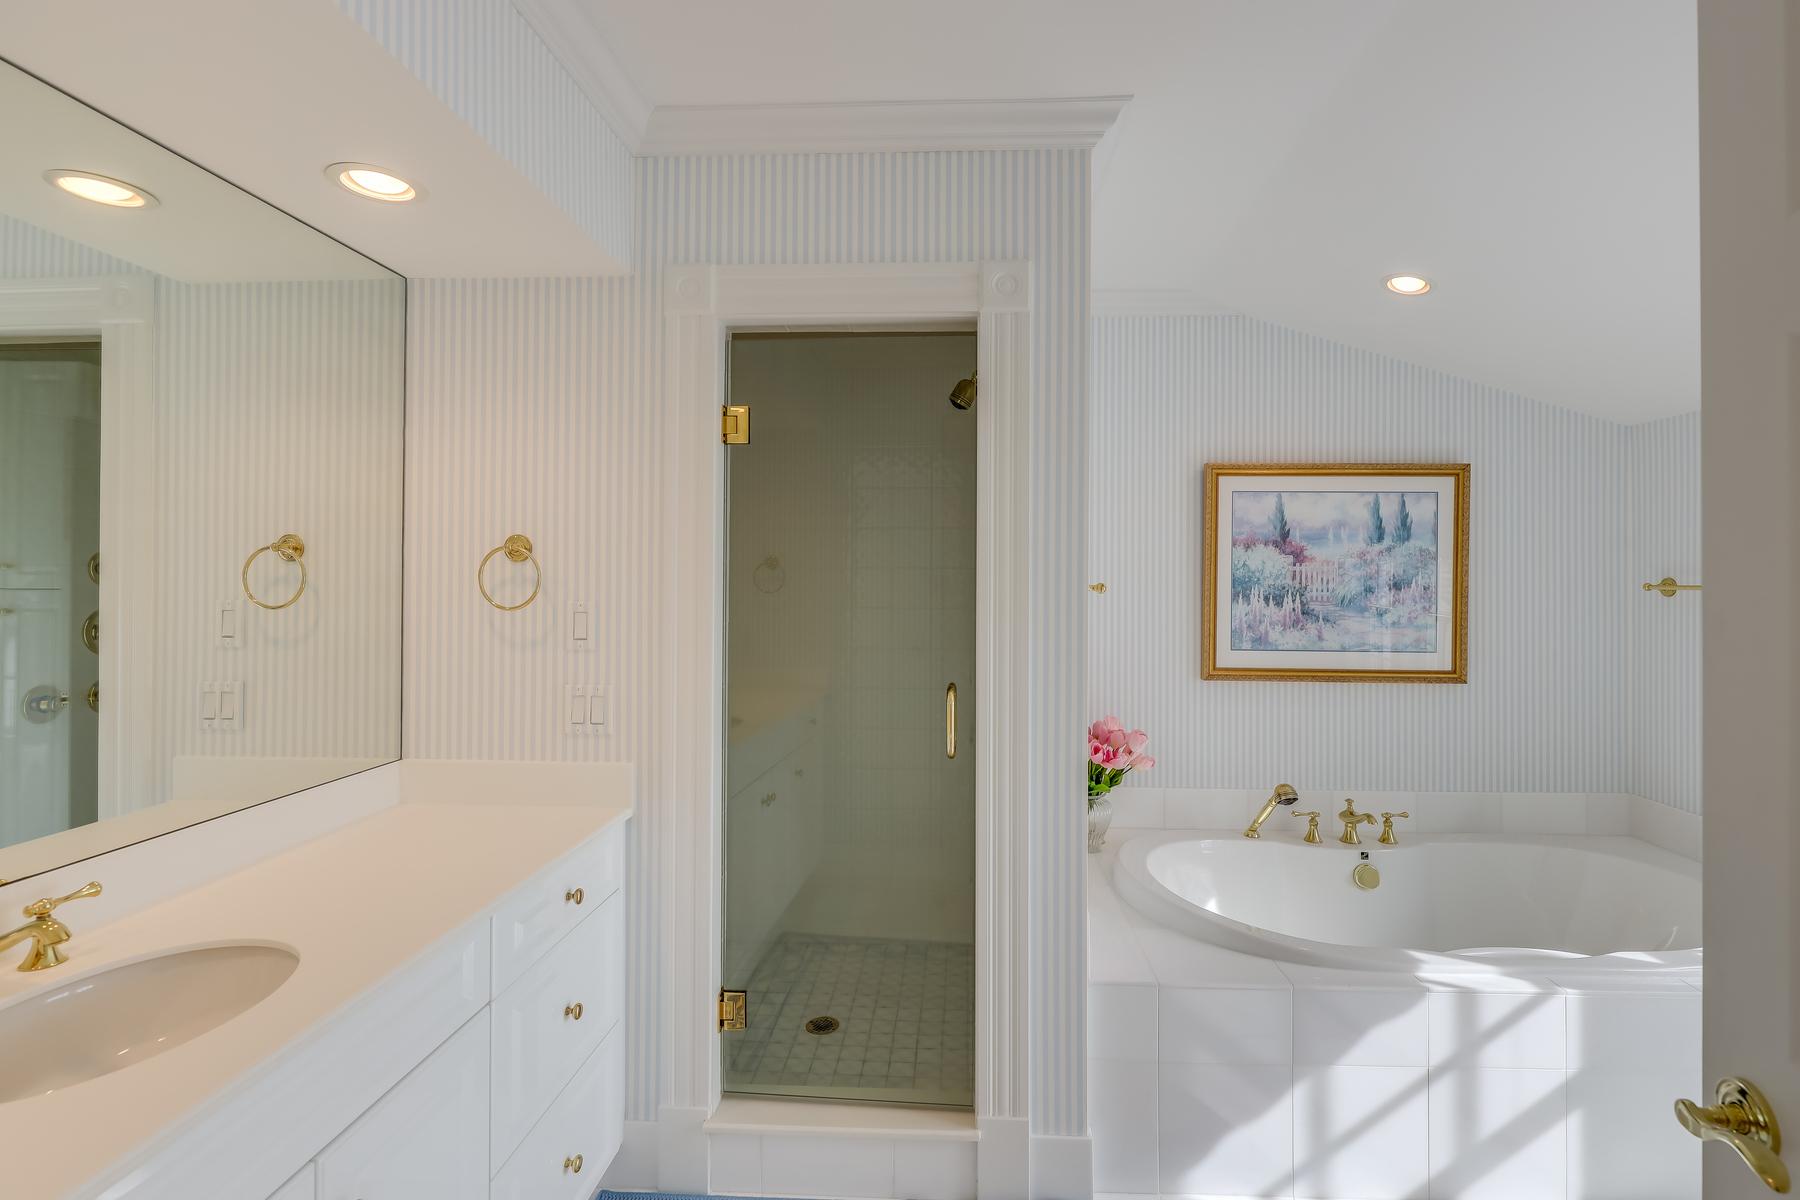 Additional photo for property listing at 60 Harbor Road, Harwich Port, MA  Harwich Port, Μασαχουσετη 02646 Ηνωμένες Πολιτείες